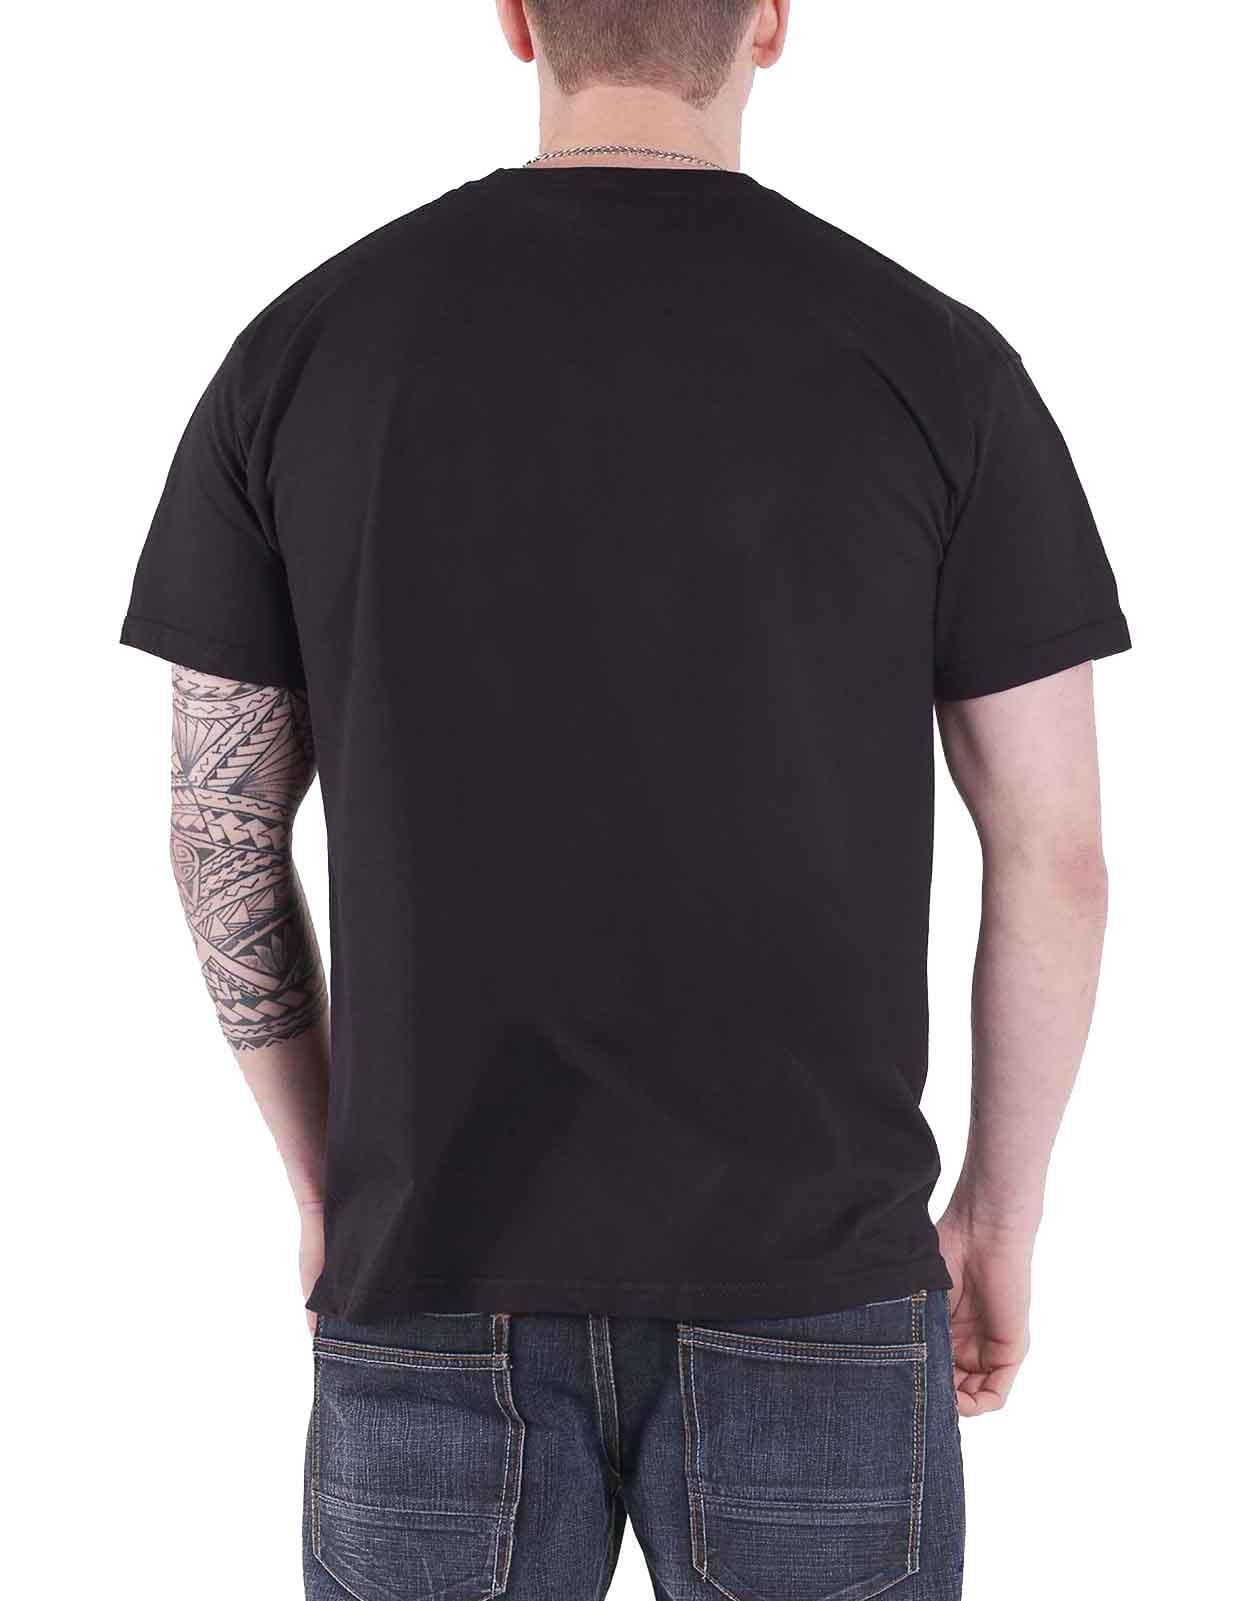 Motorhead-T-Shirt-Lemmy-RIP-England-warpig-clean-your-clock-official-new-mens Indexbild 45